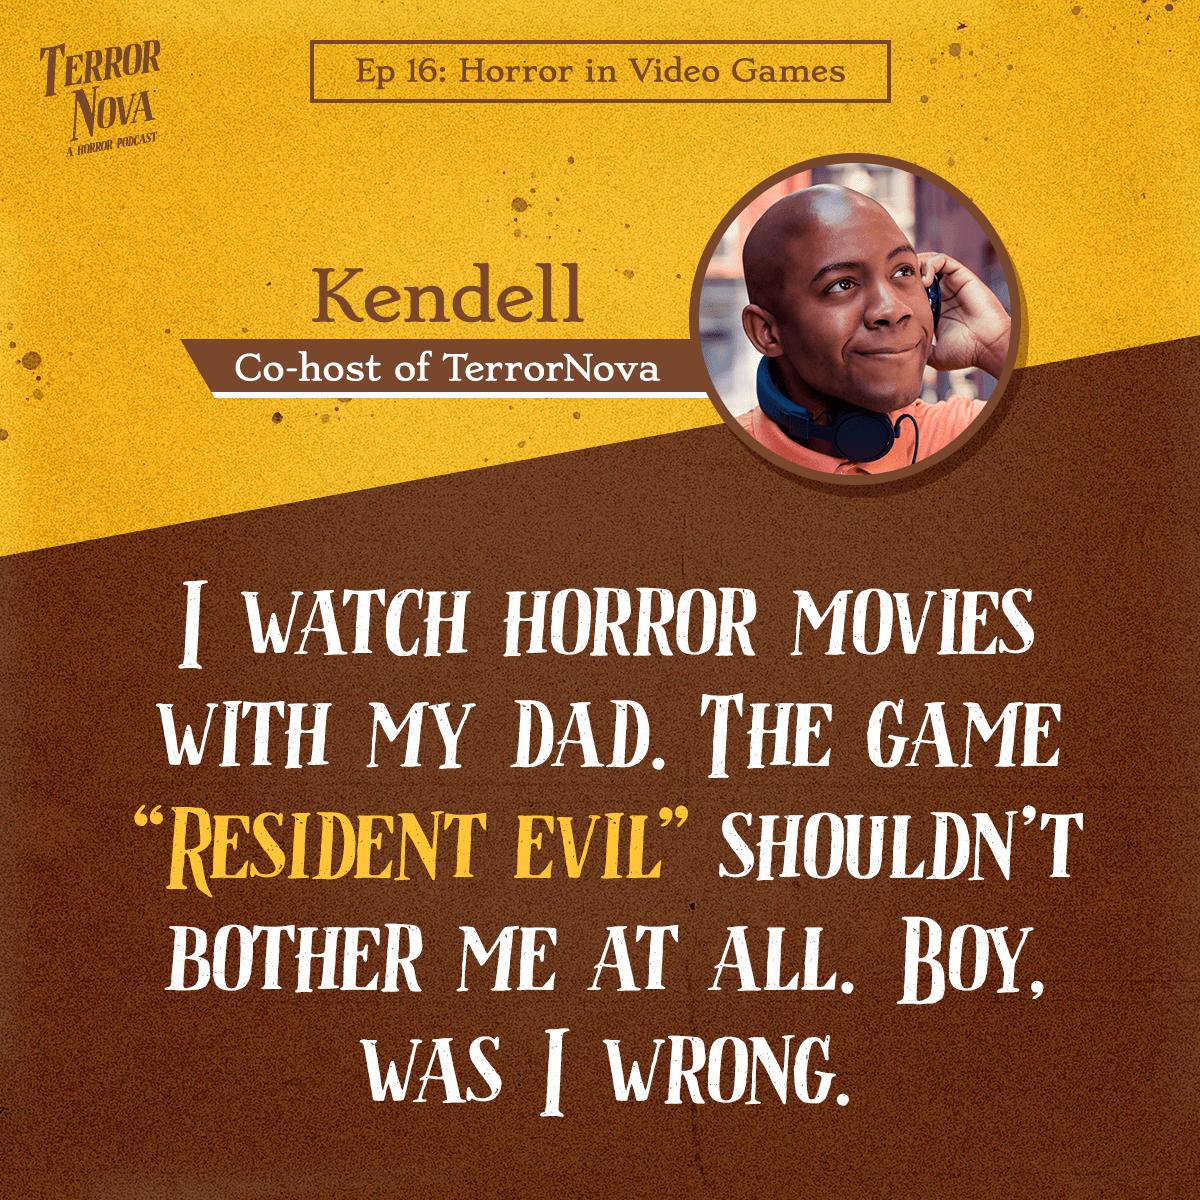 TerrorNova Podcast Ep 16 Kendell